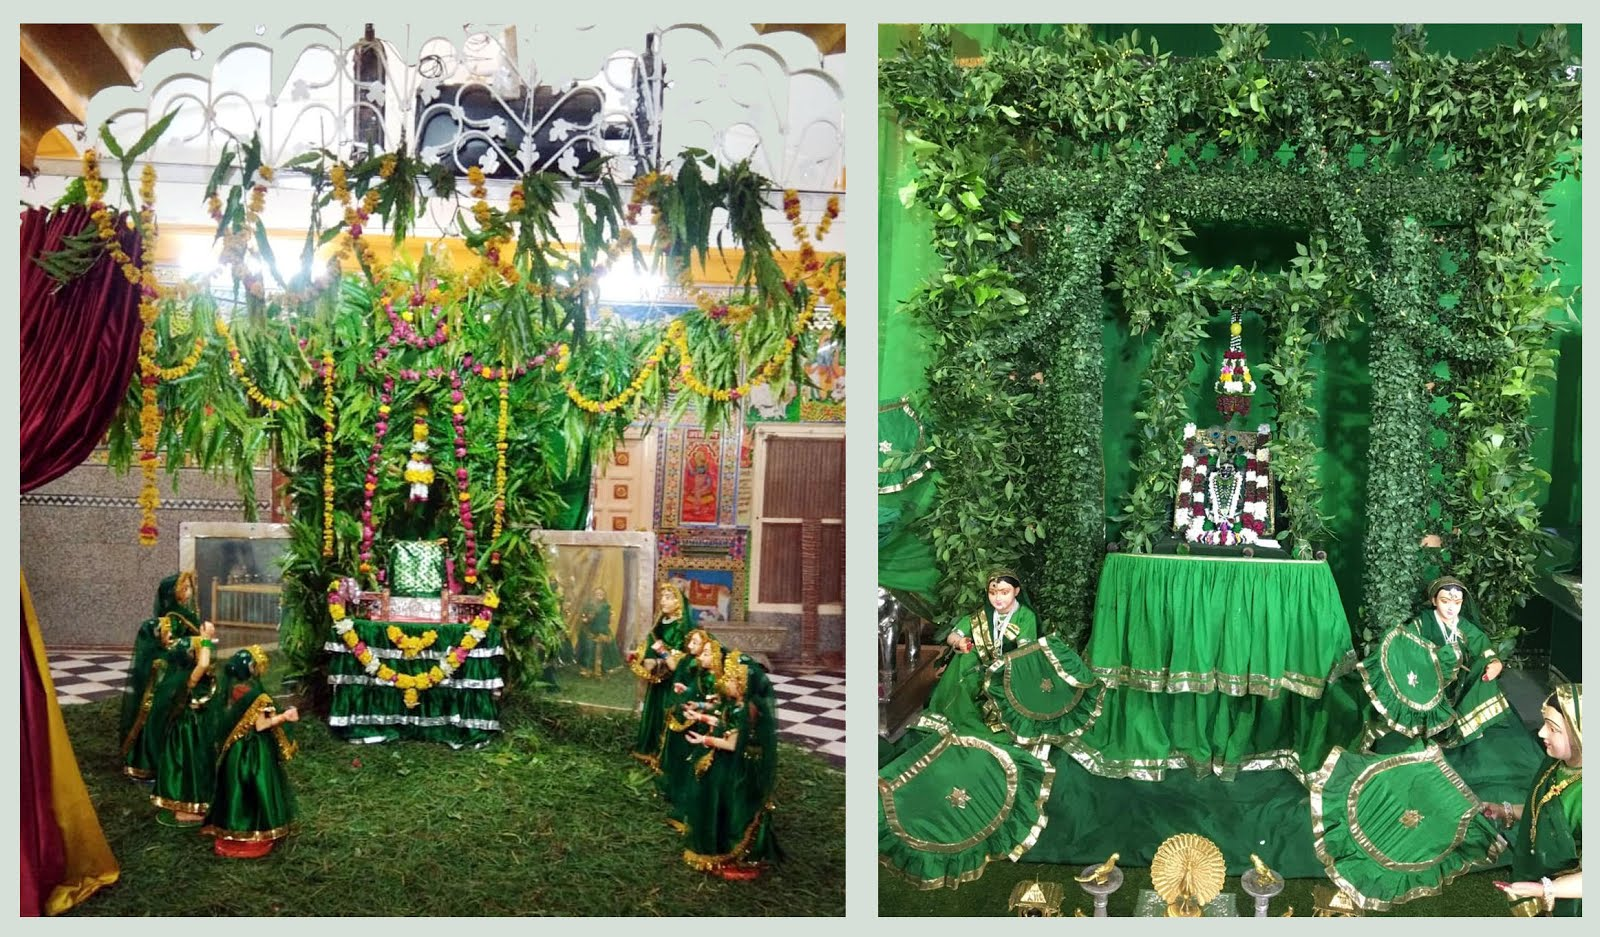 Jhabua News- हरियाली अमावस्या पर हरितिमा से आच्छादित हिण्डोले में झुले भगवान गोवर्धननाथ